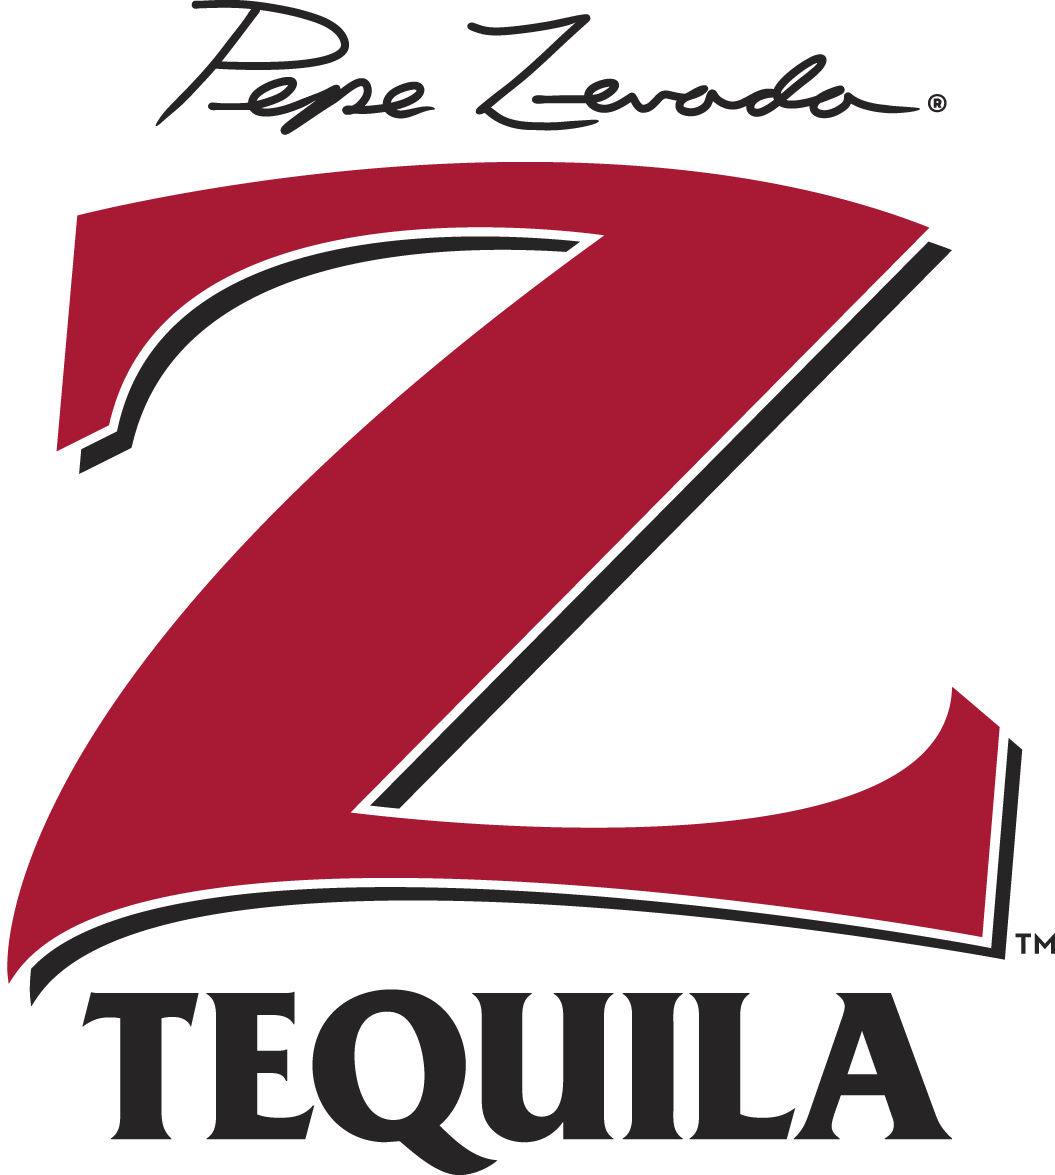 Z_Tequila_logo_CMYK_042512.png